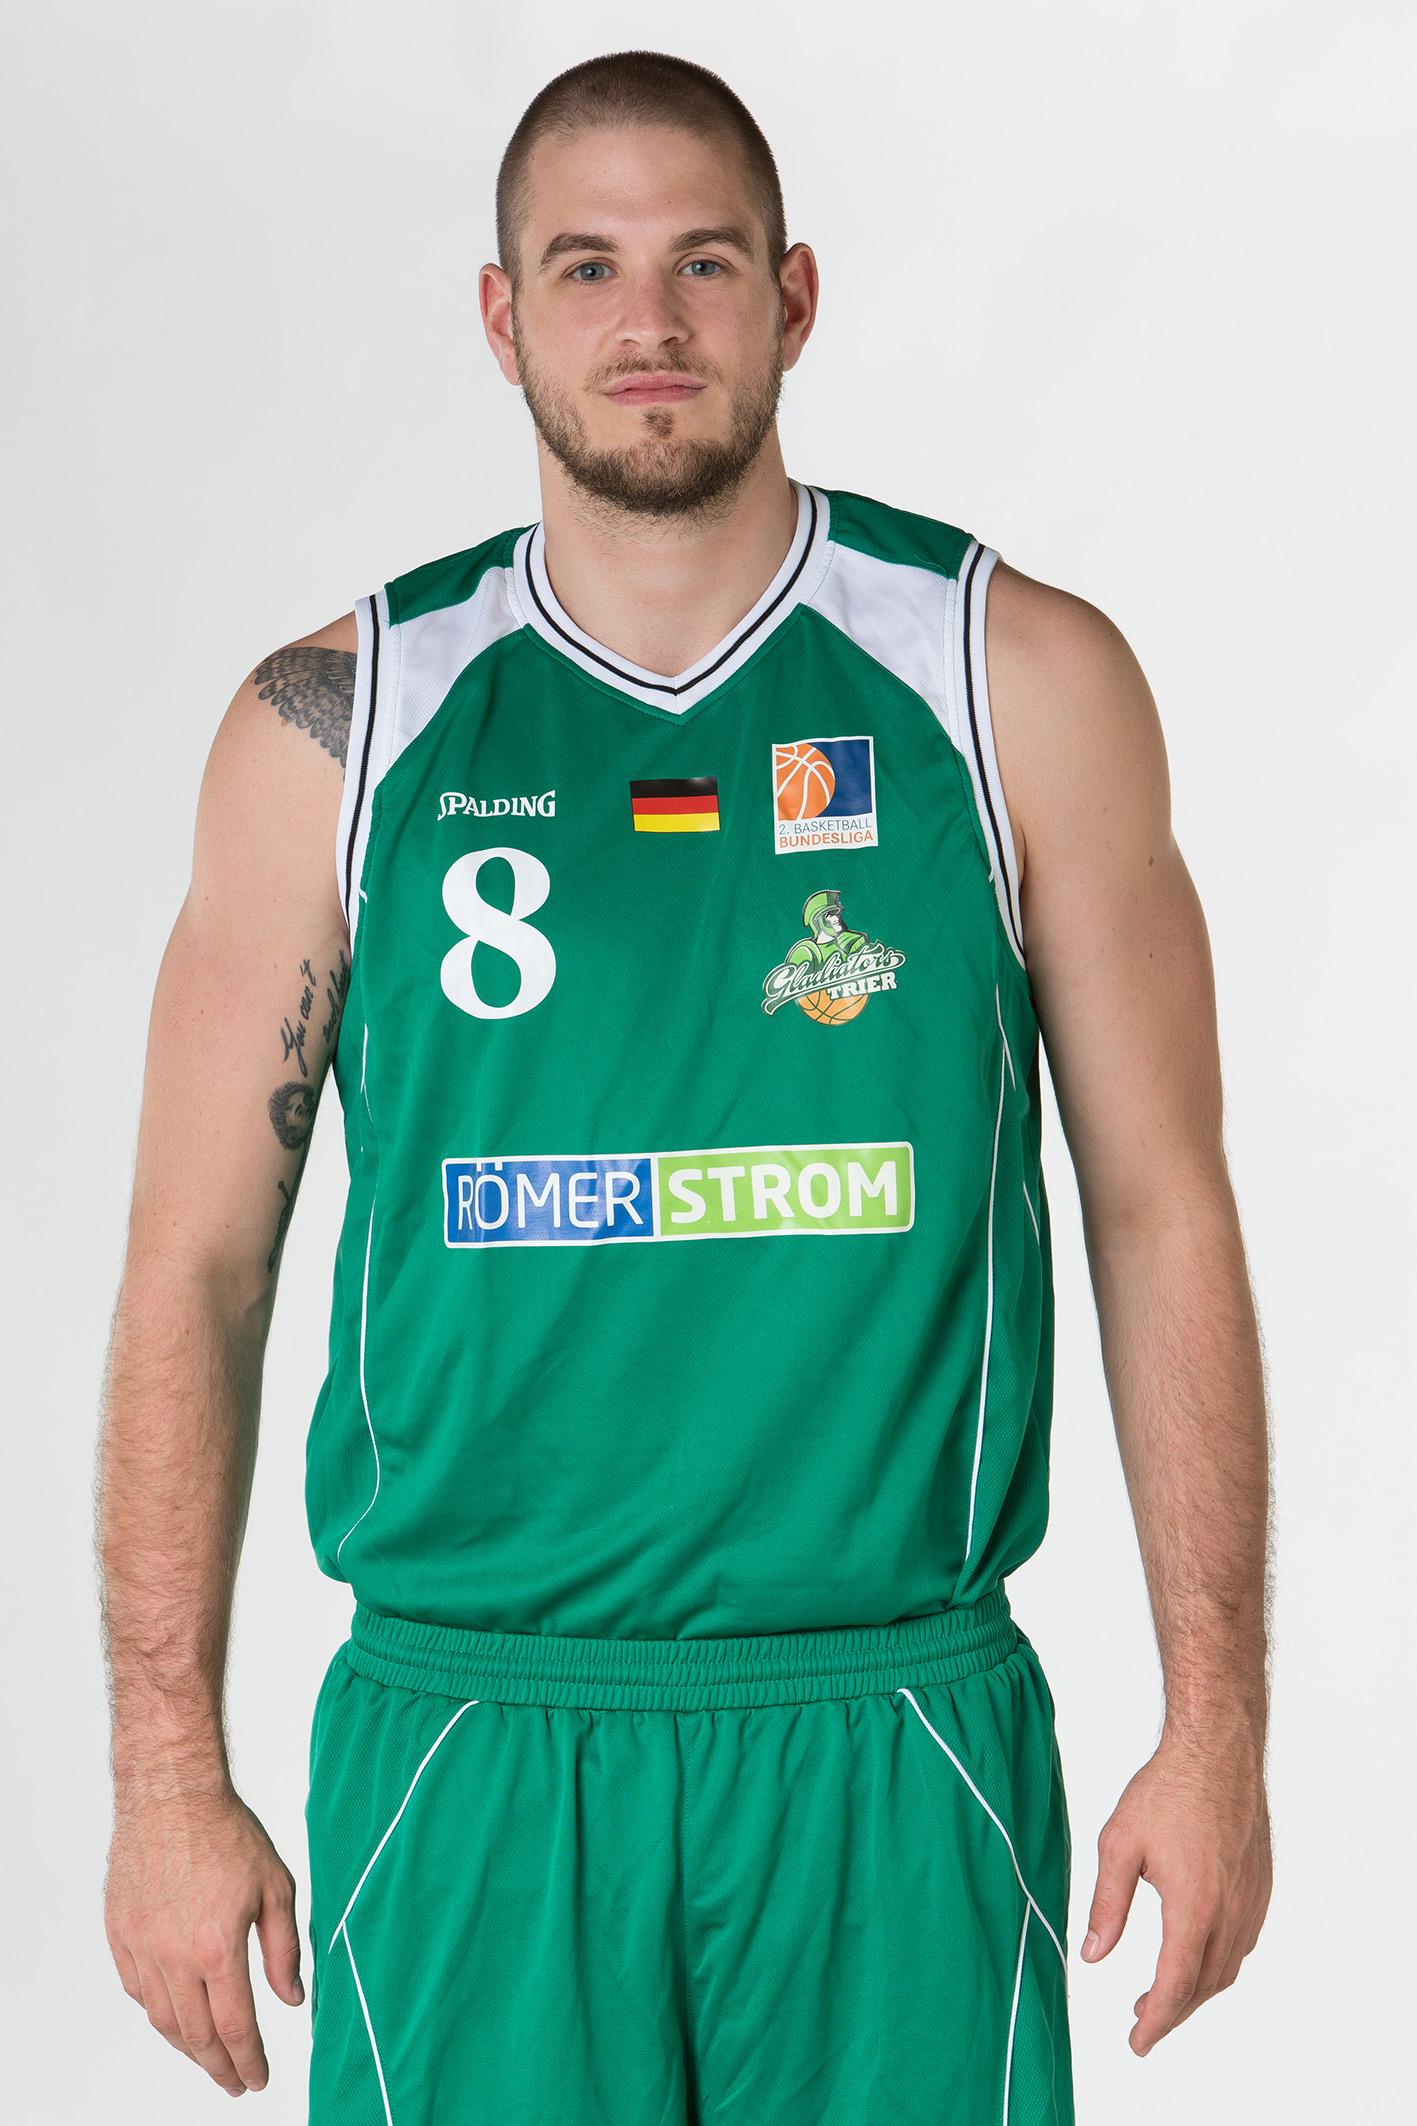 Kilian Dietz